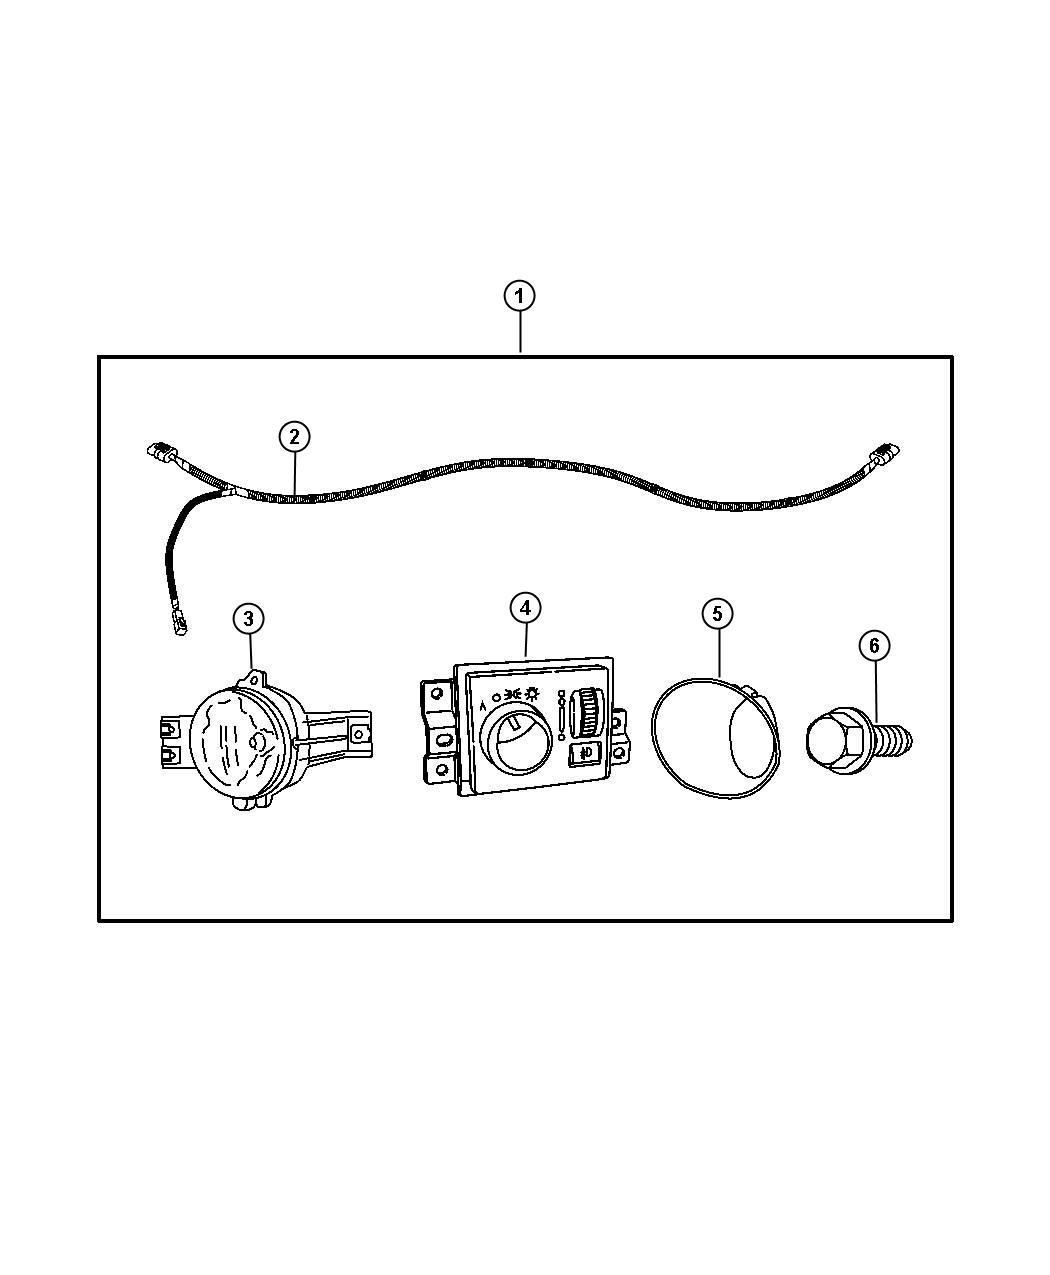 Jeep Renegade Fog Lights Complete Kit Includes